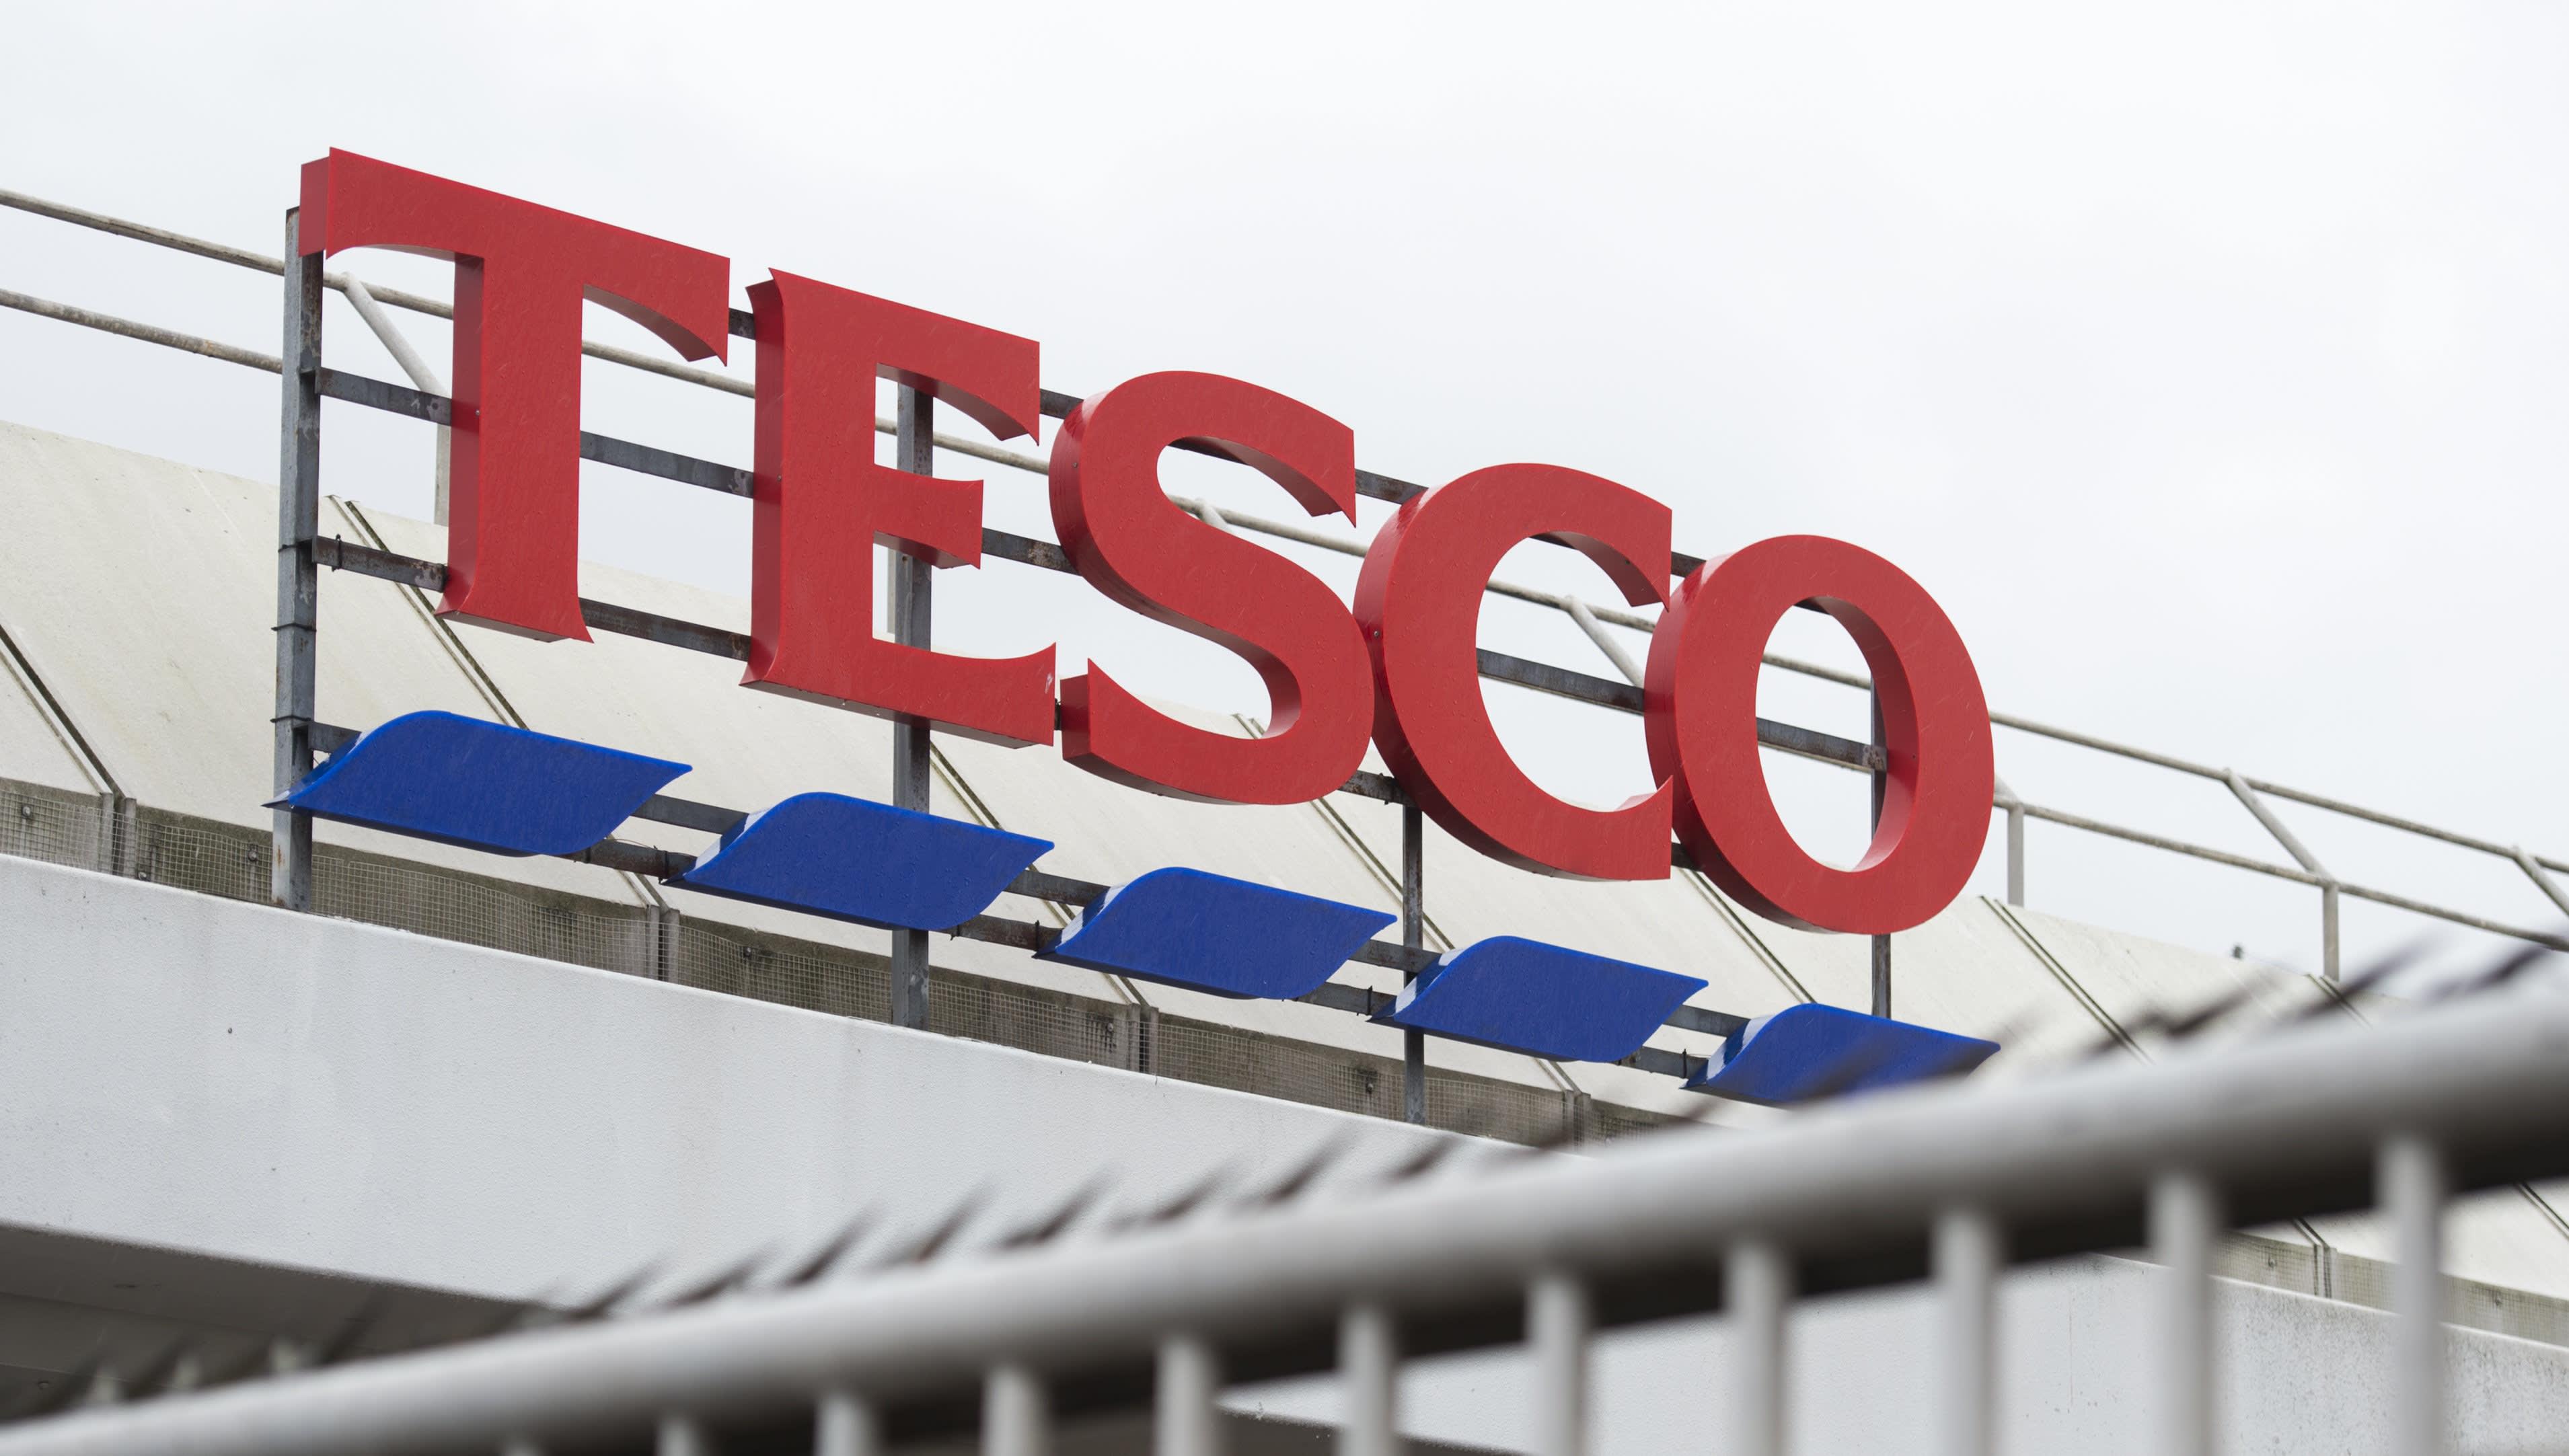 Tesco Bank exits mortgage market